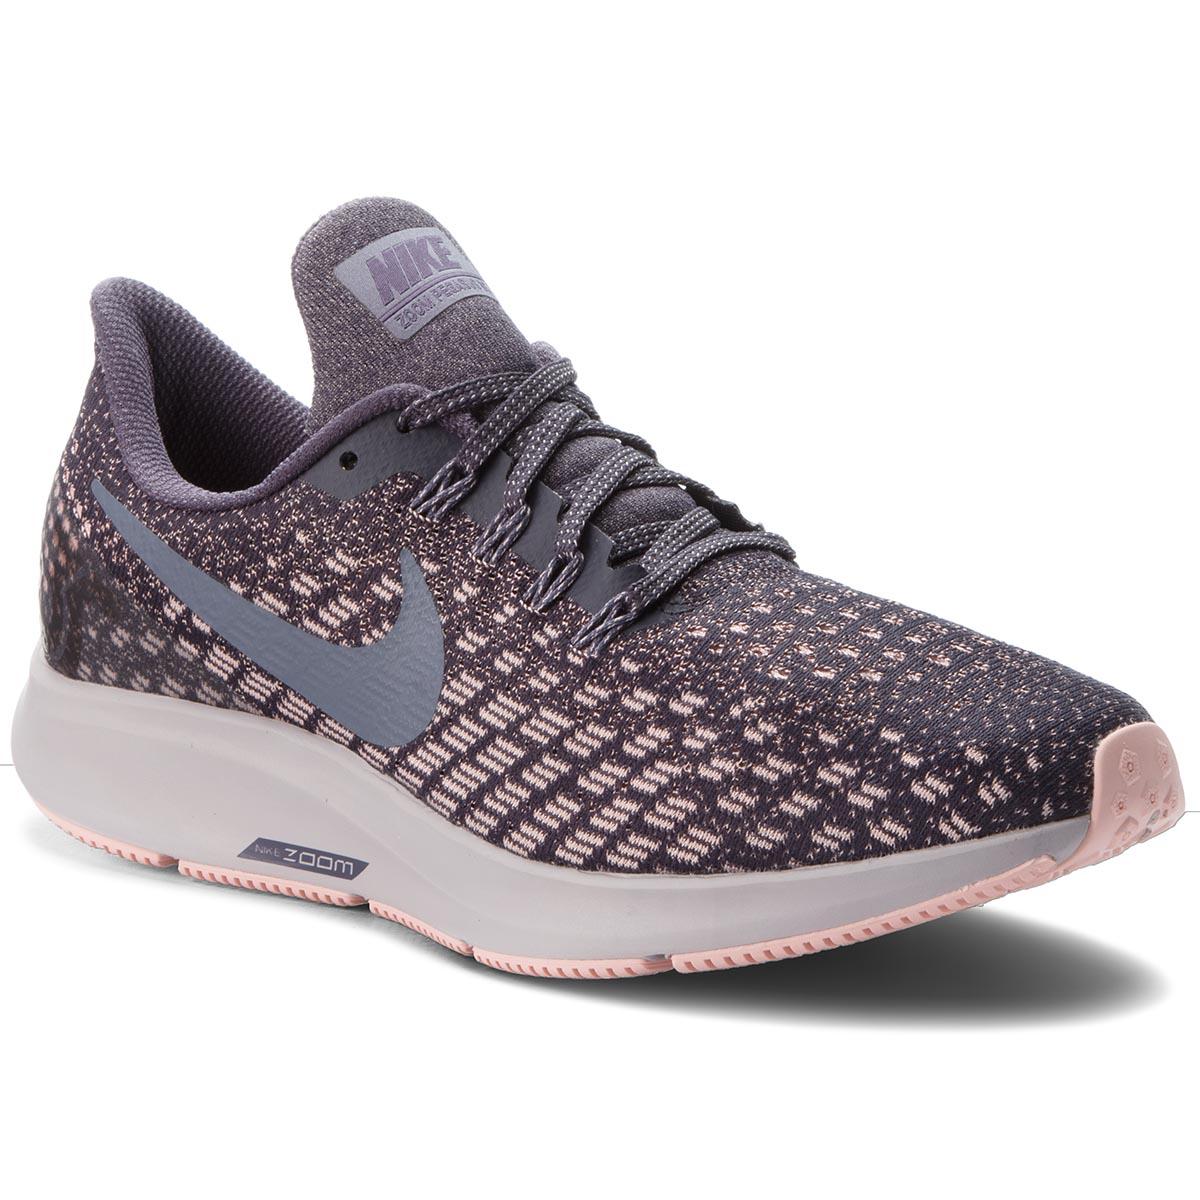 c3ef22fe4 Shoes NIKE - Air Zoom Pegasus 35 942855 600 Bright Crimson/Ice Blue ...